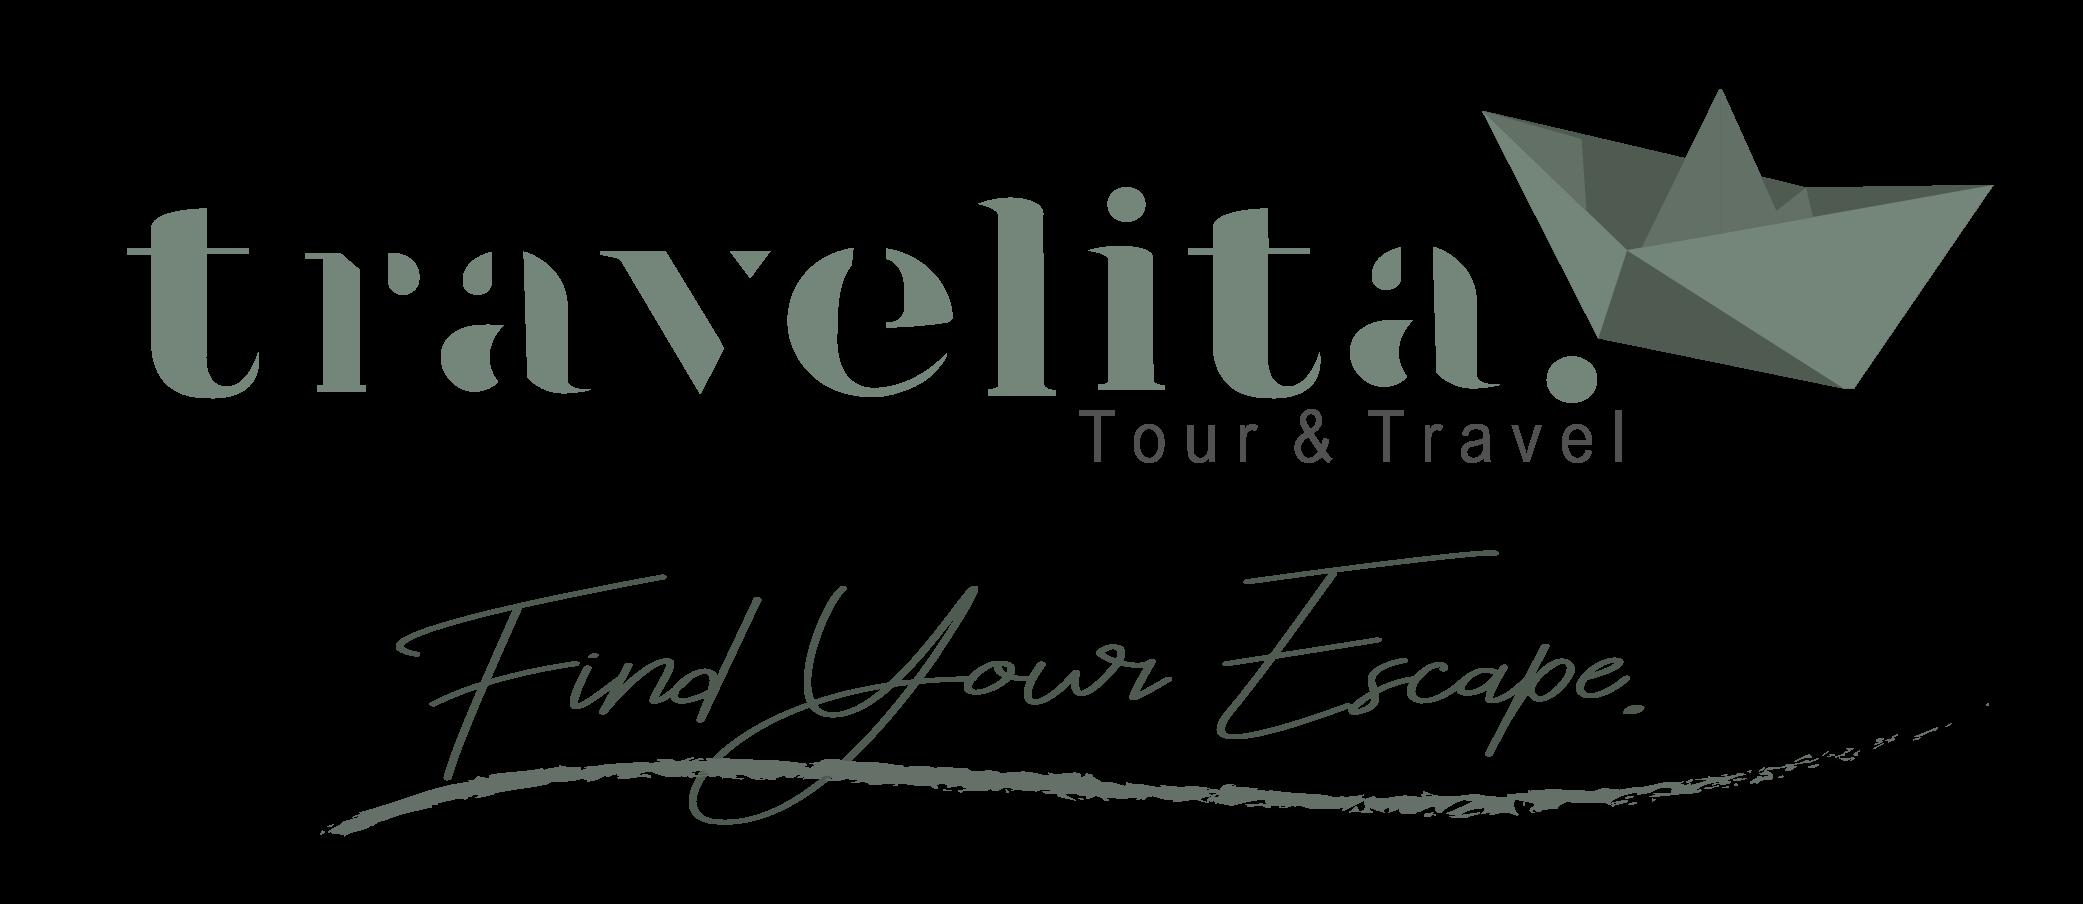 Travelita